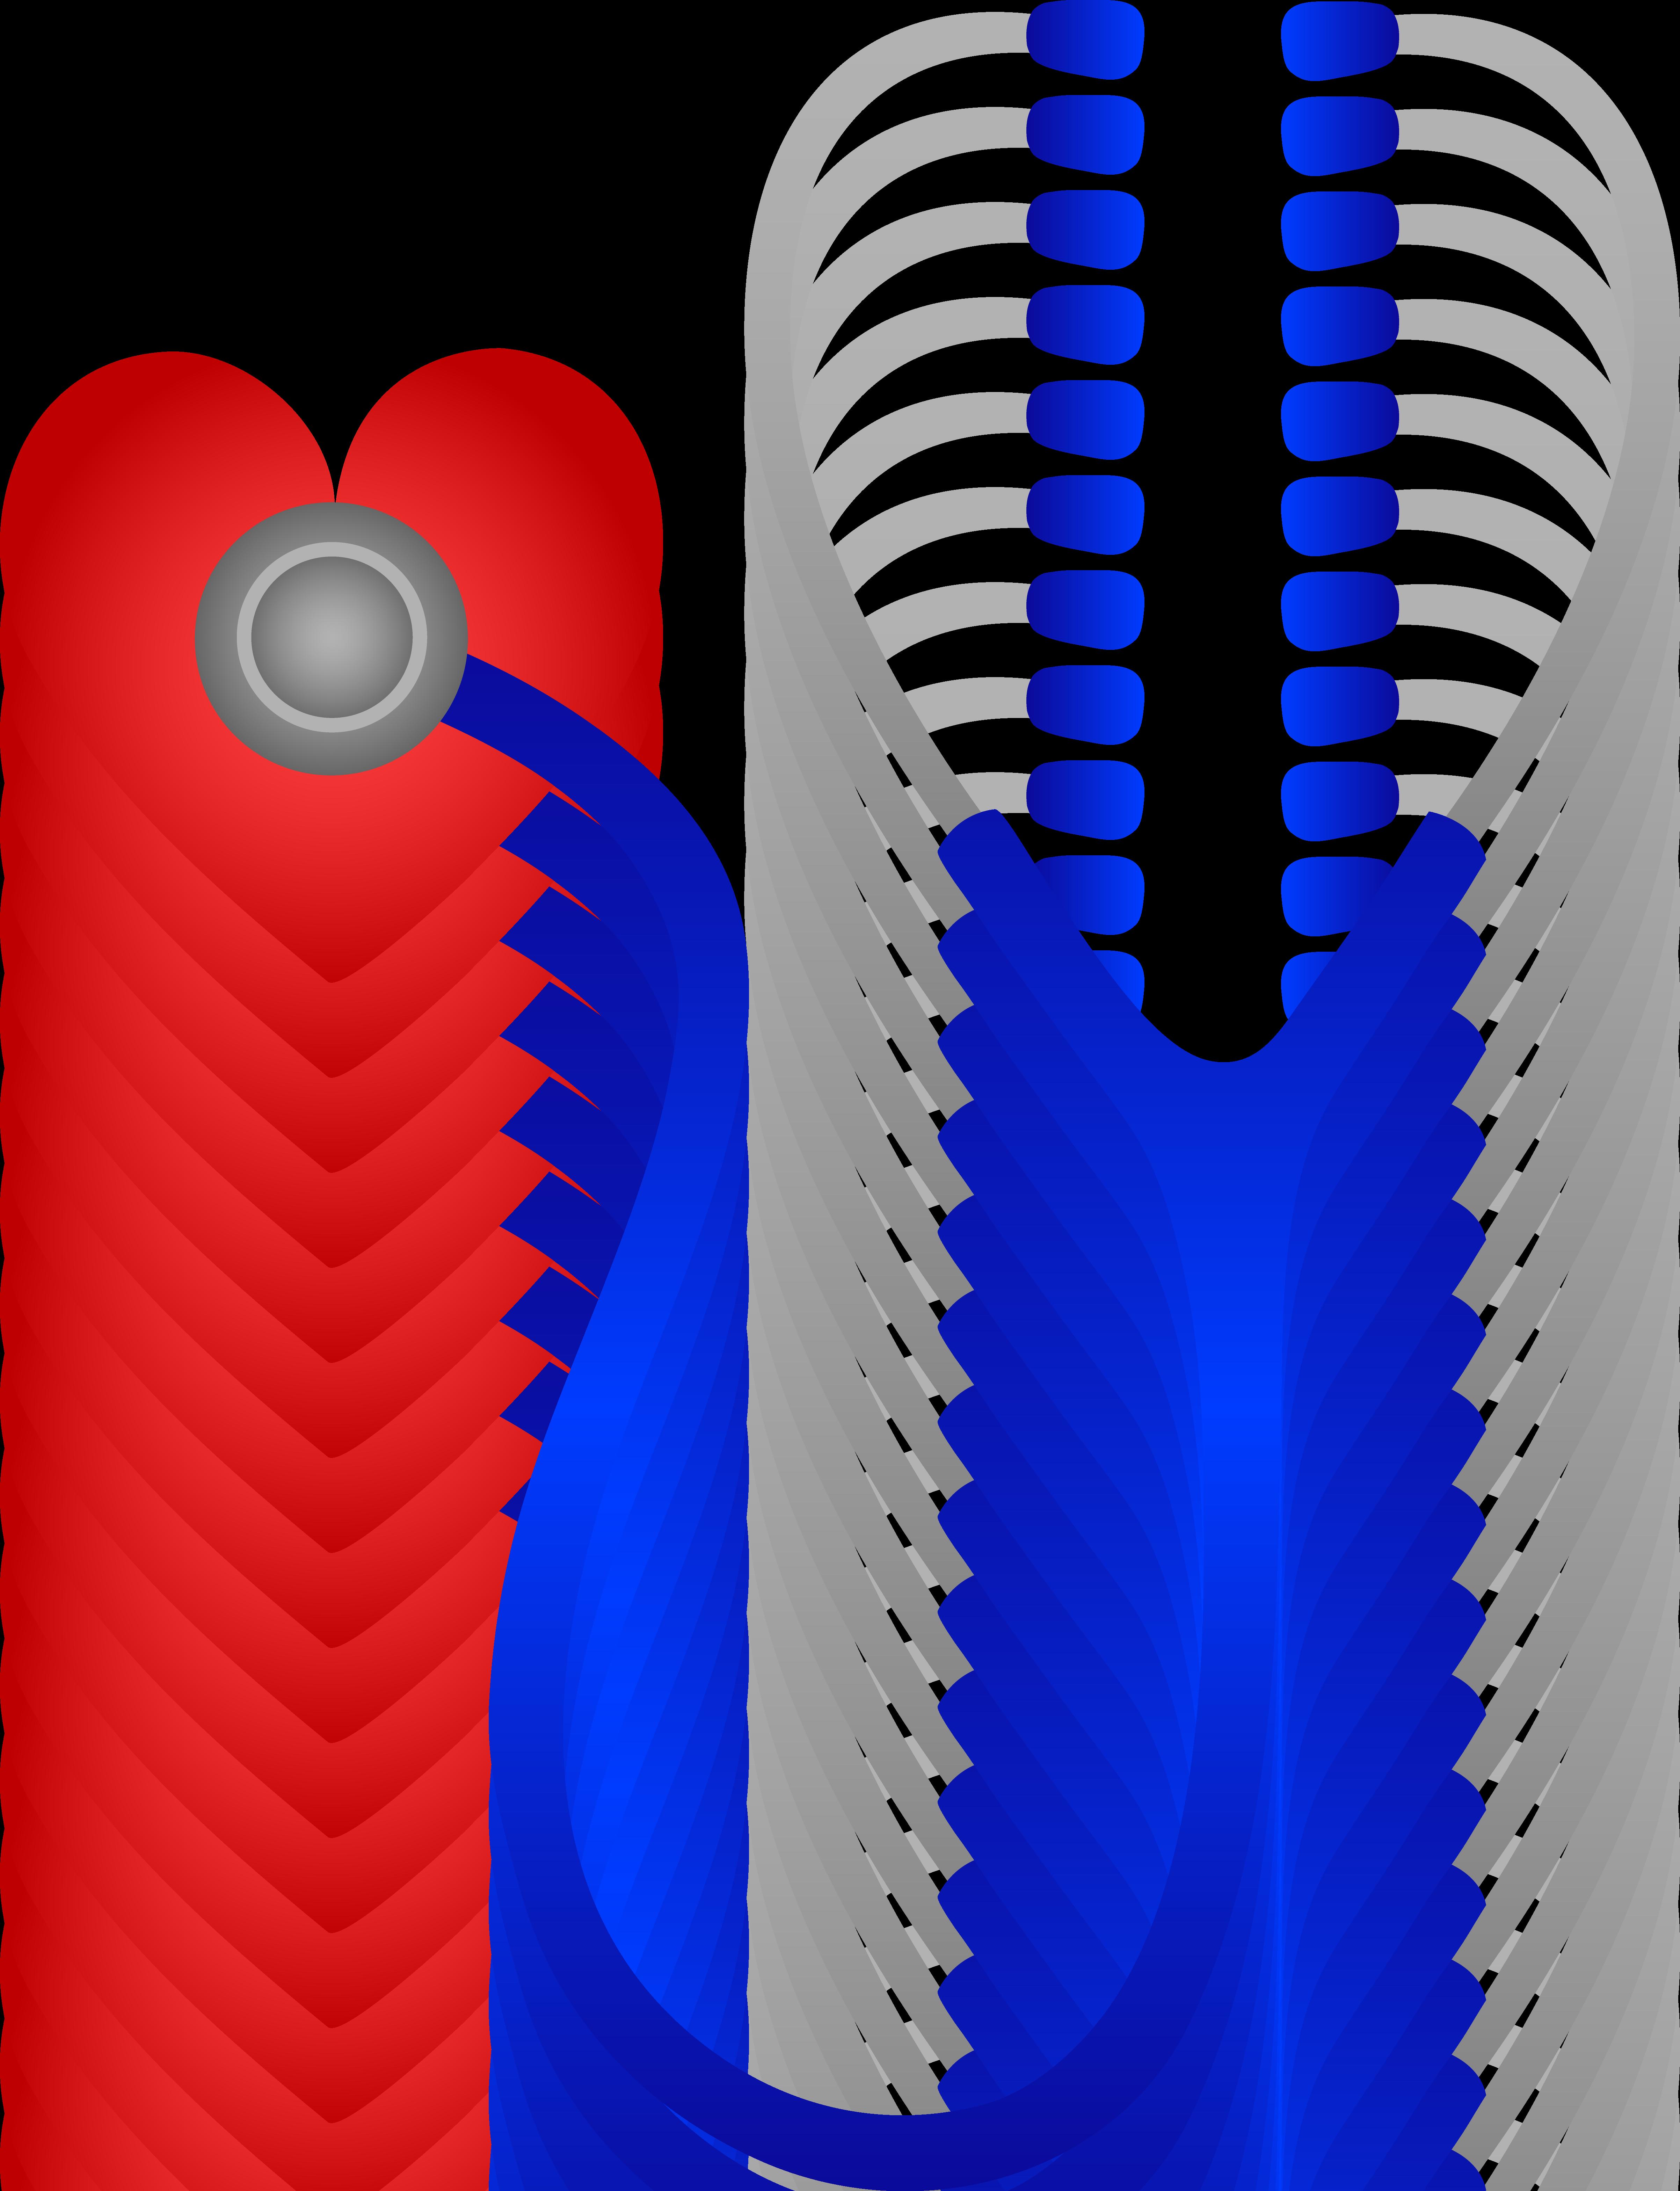 royalty free stock Listening to heart beat. Vector cartoons stethoscope